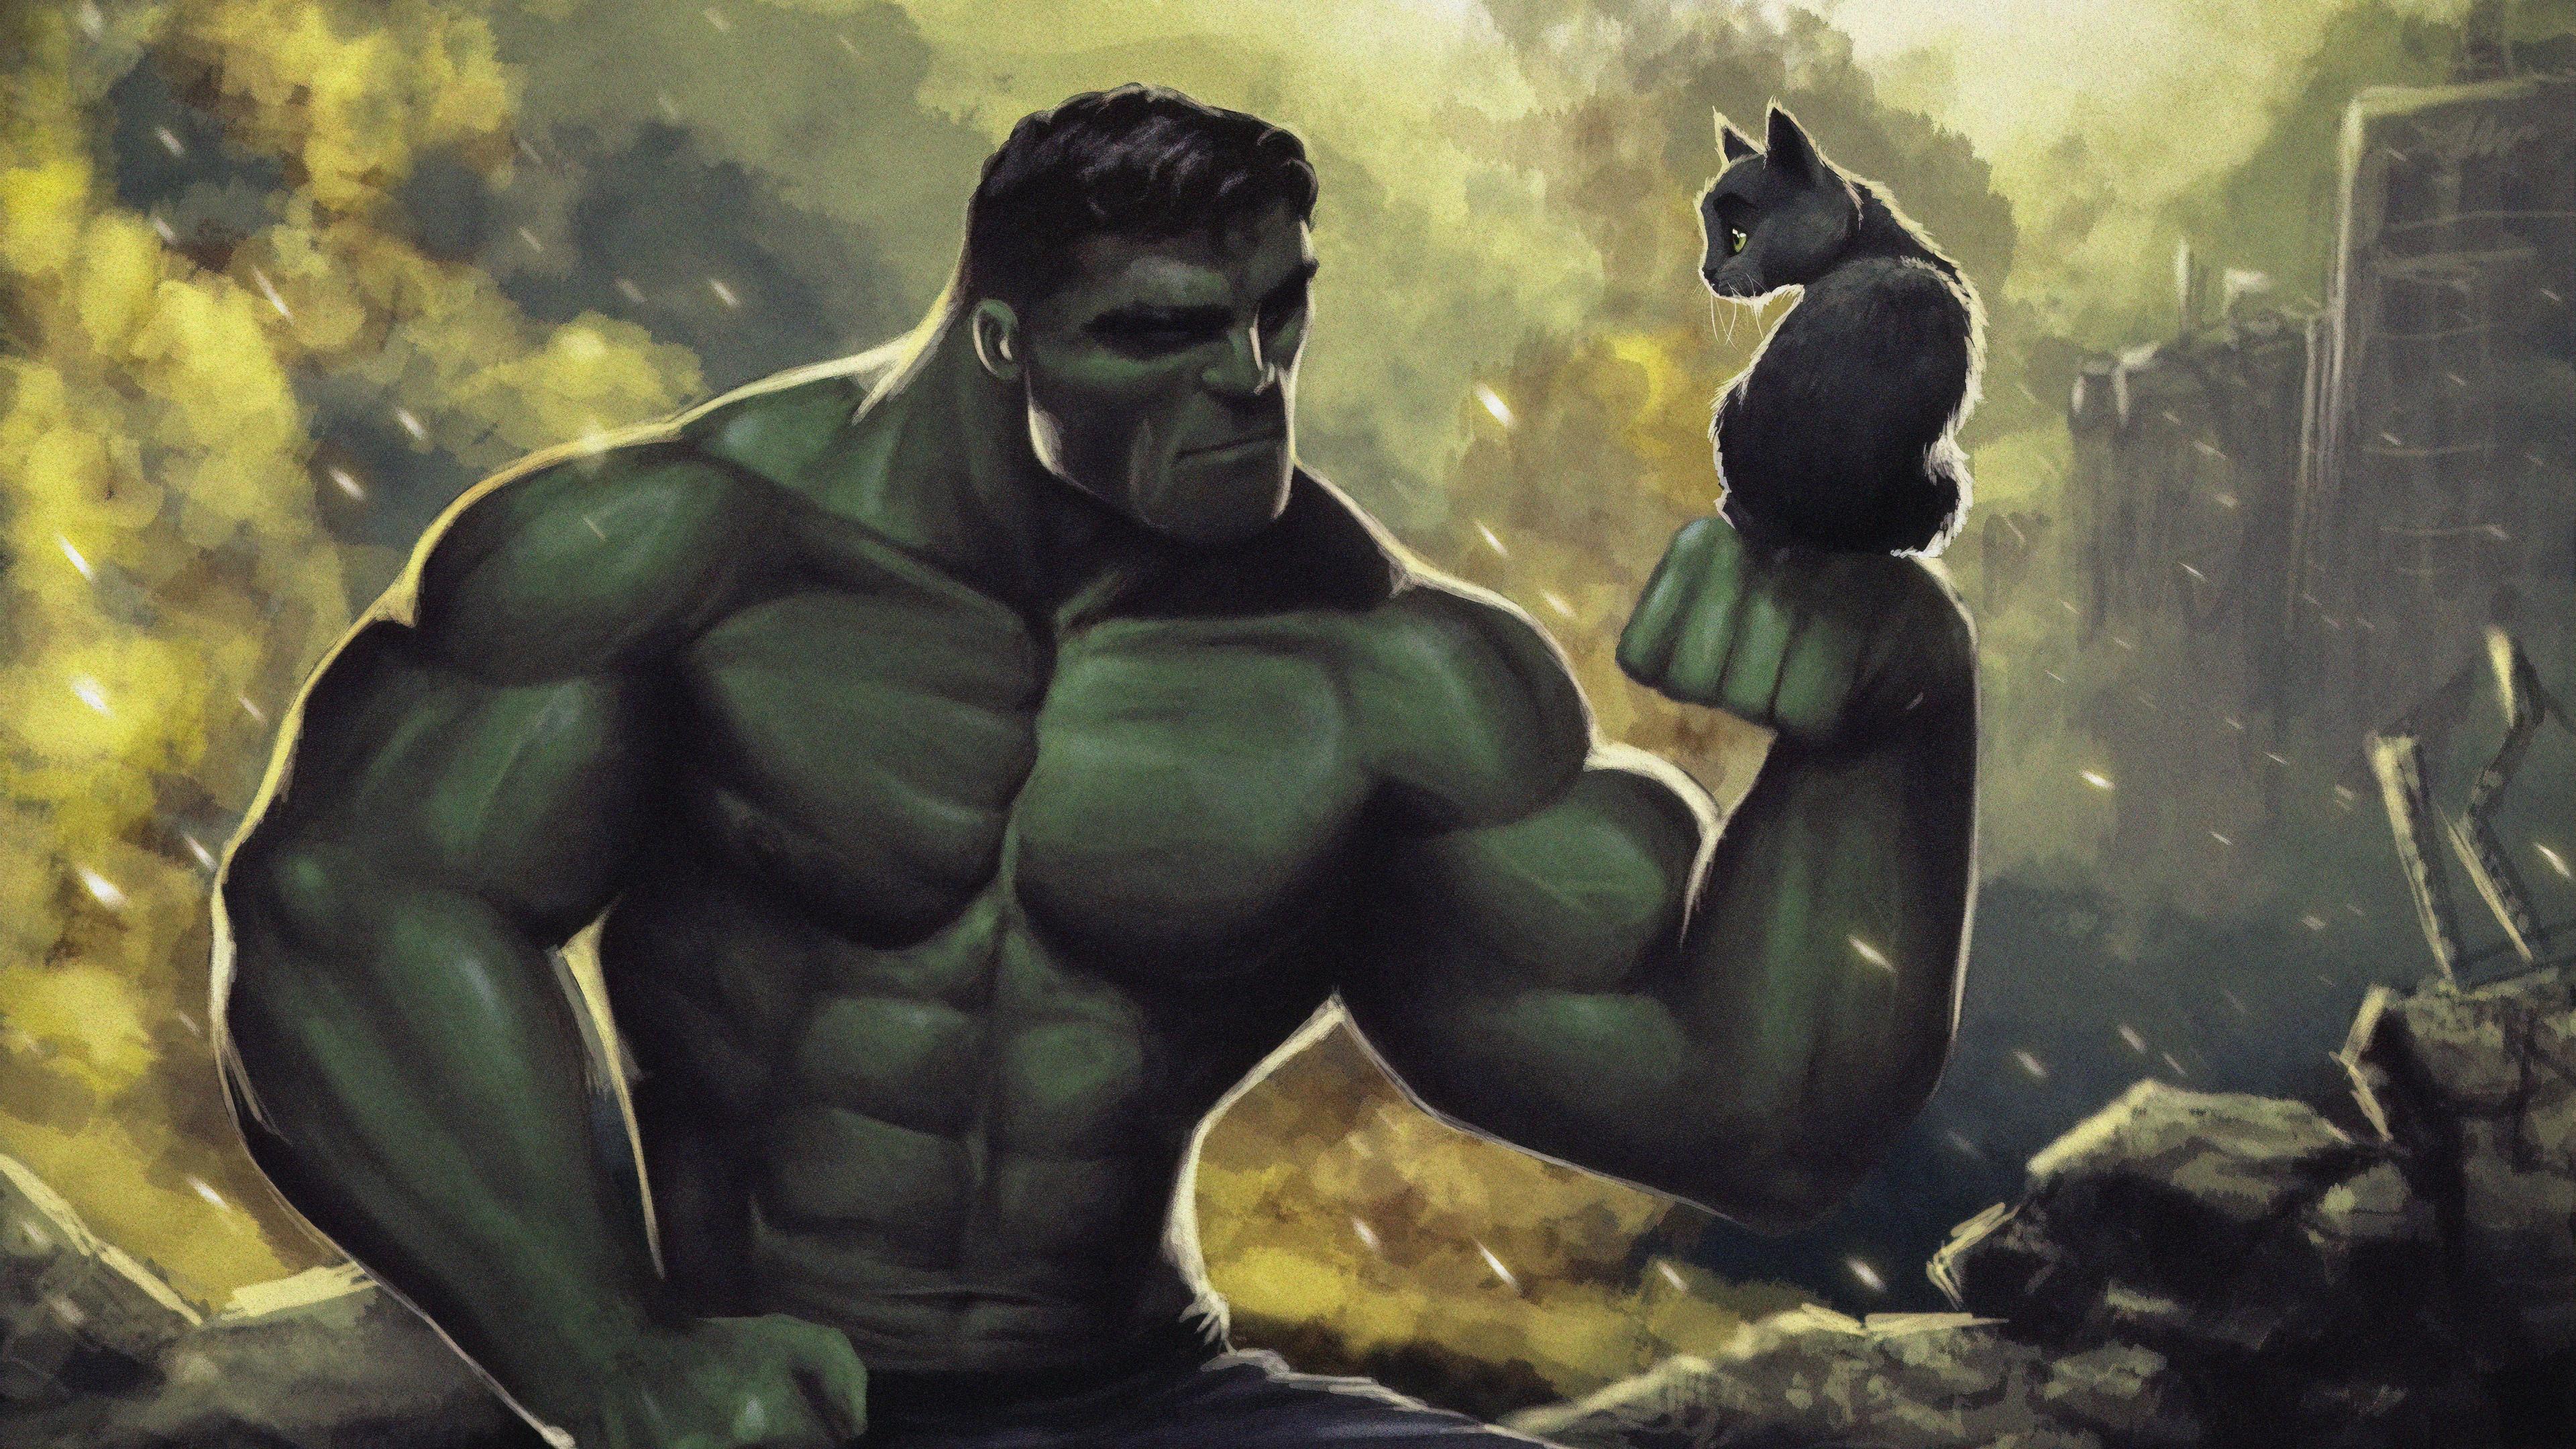 hulk sketch art 1563220264 - Hulk Sketch Art - superheroes wallpapers, hulk wallpapers, hd-wallpapers, digital art wallpapers, artwork wallpapers, 4k-wallpapers